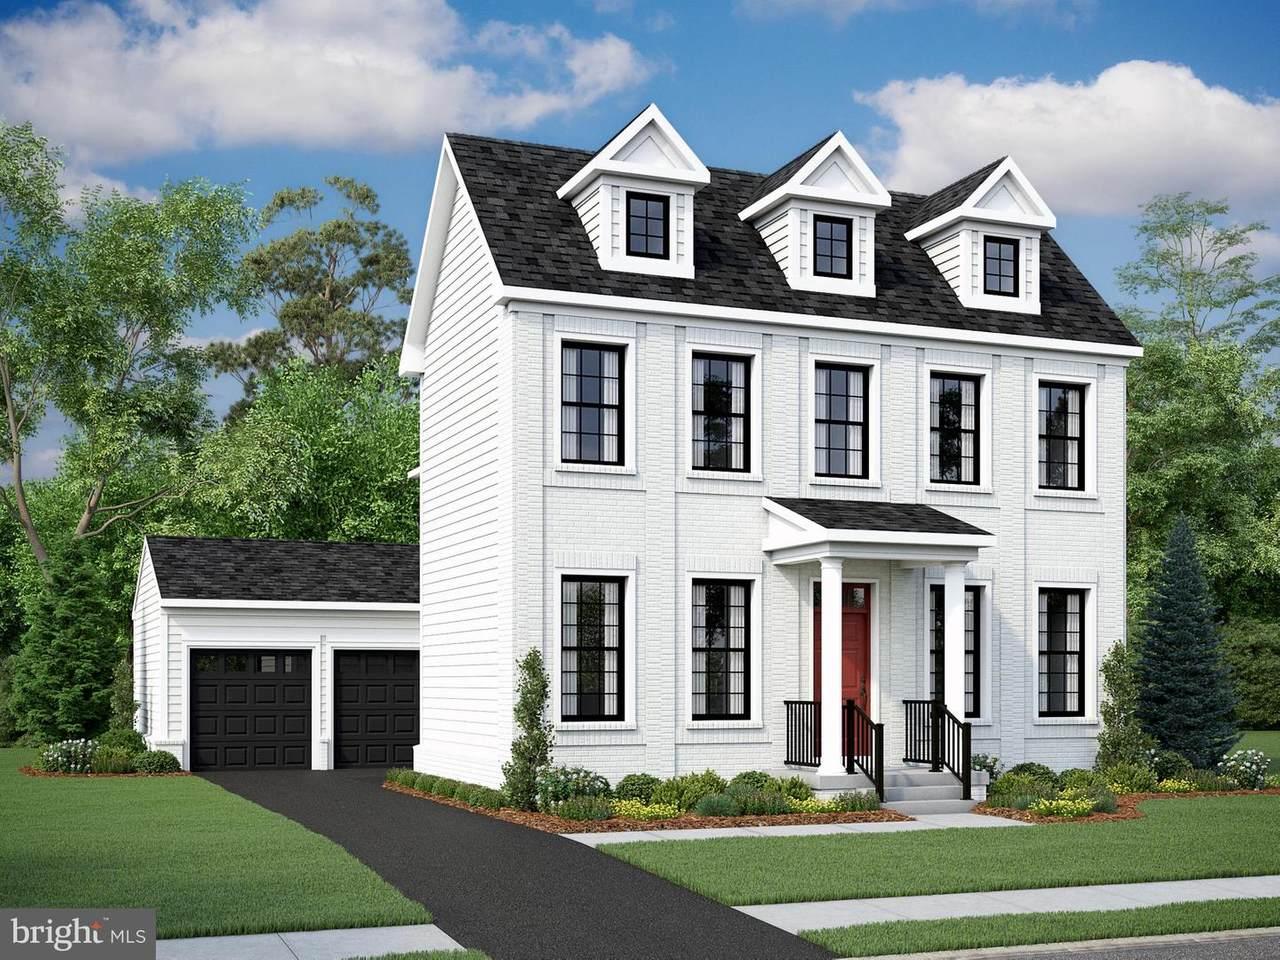 4233 Manor (Rosita) Drive - Photo 1